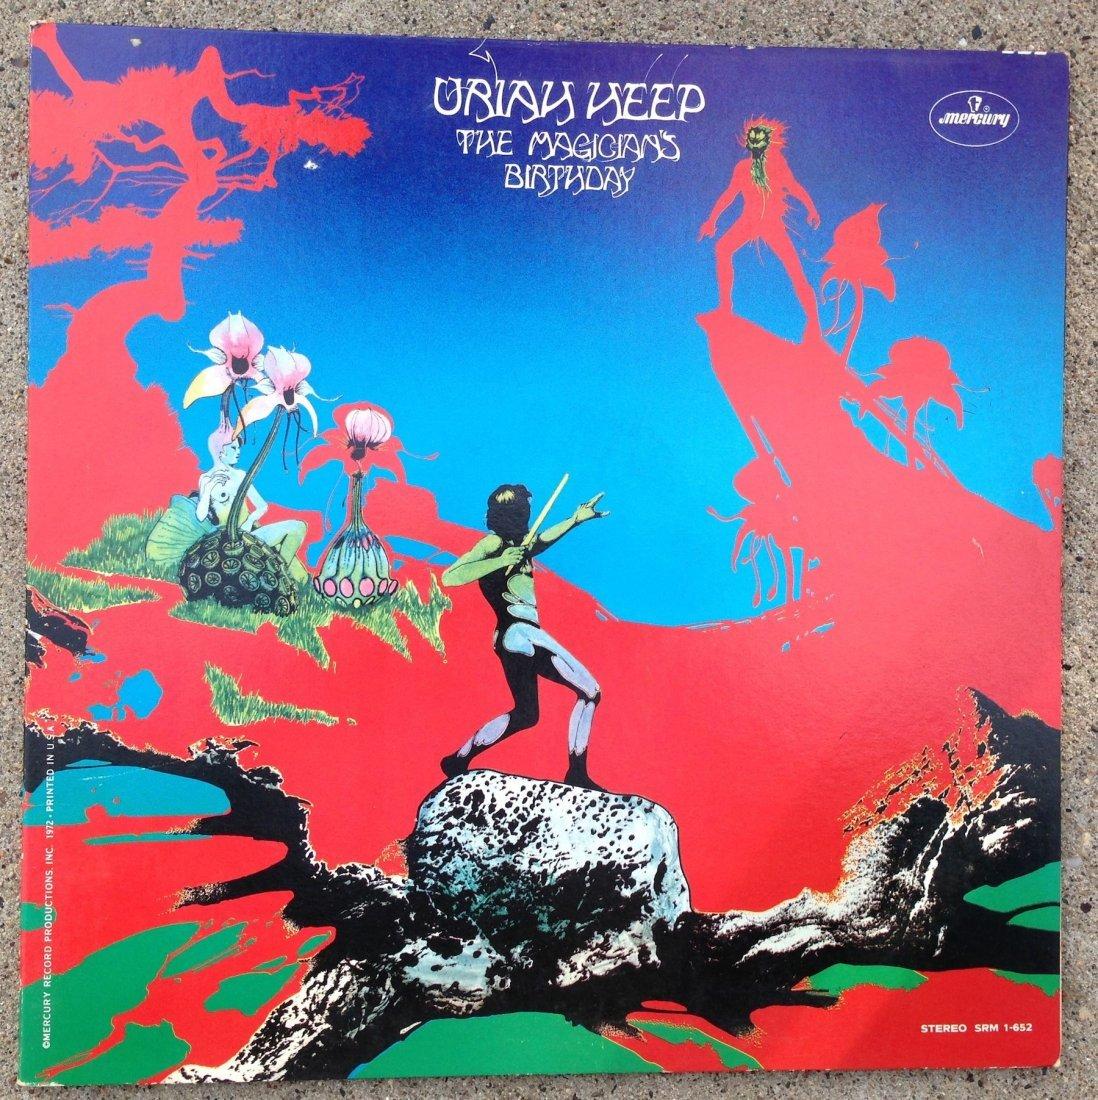 URIAH HEEP - MAGICIAN'S BIRTHDAY ALBUM